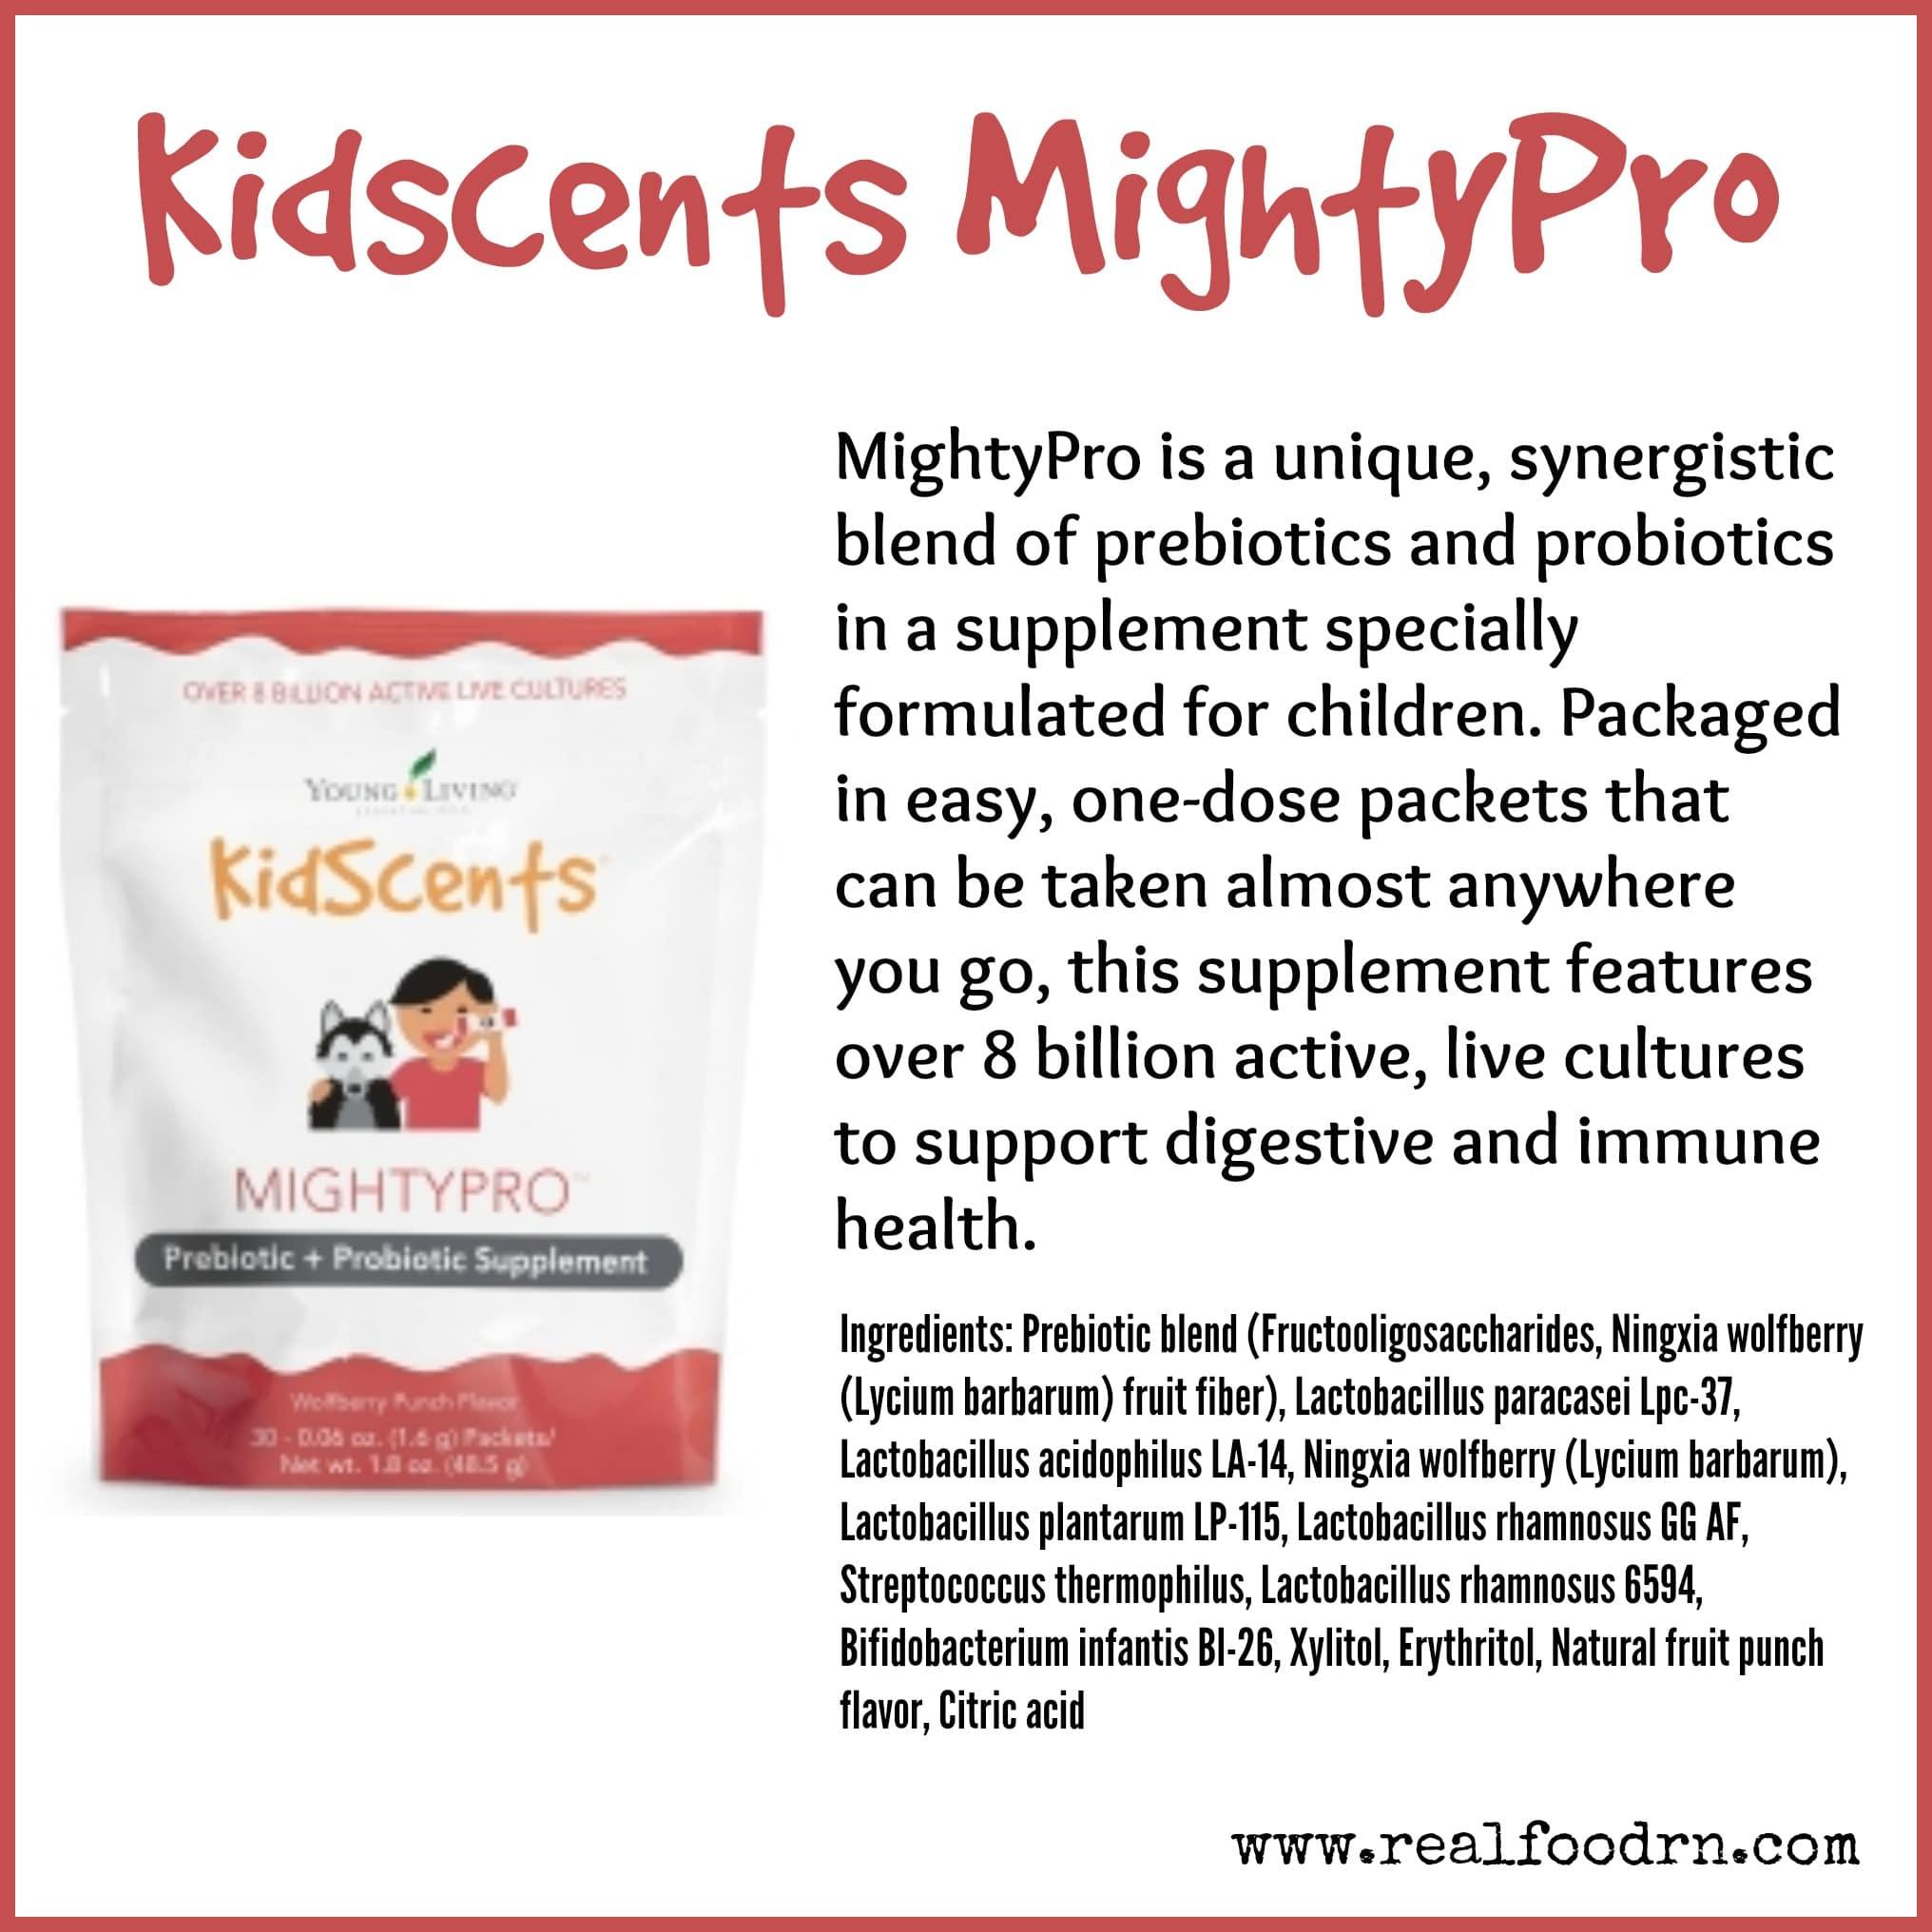 KidScents MightyPro